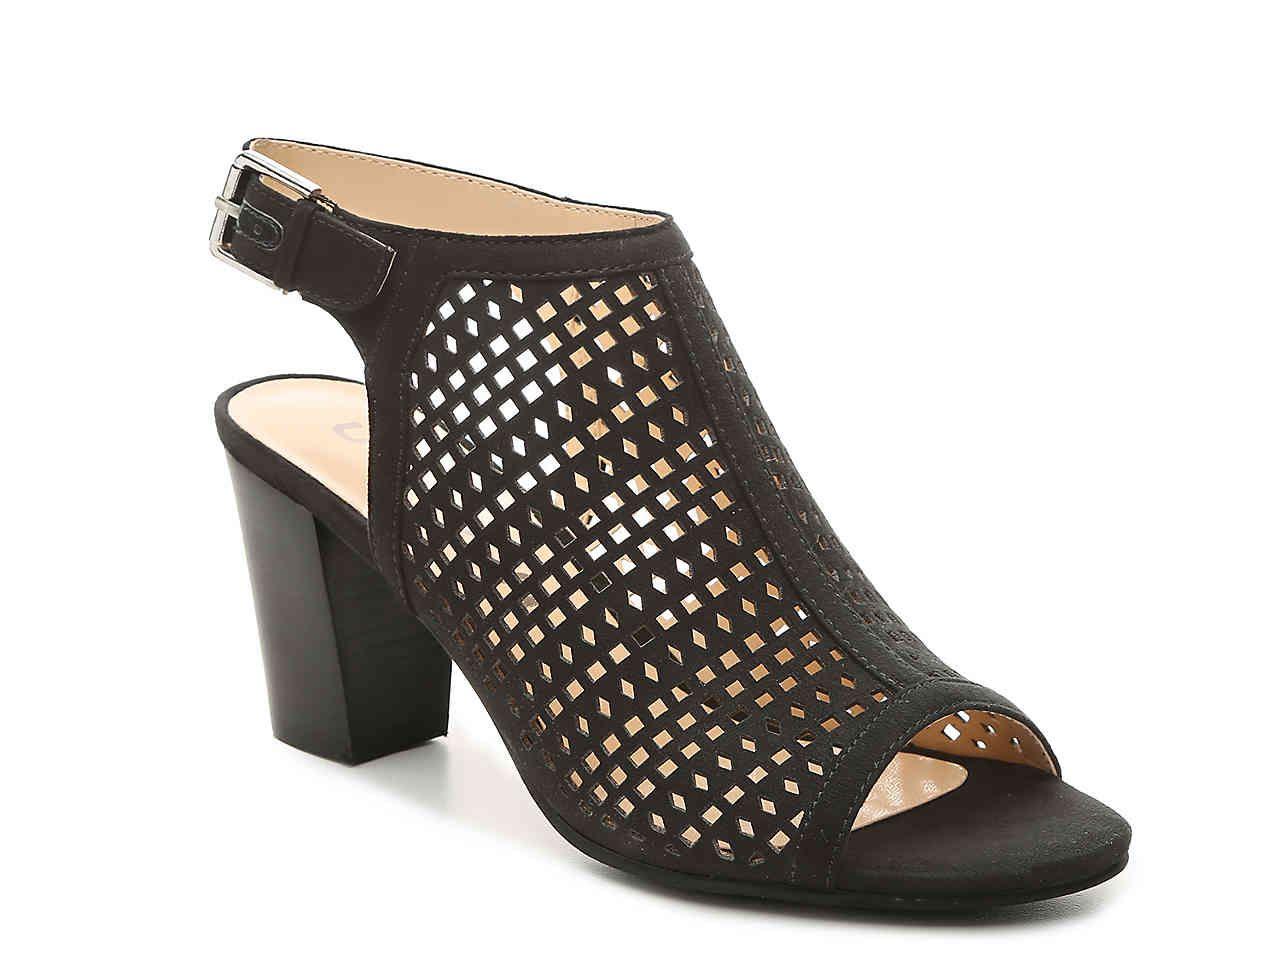 23abb9d06 Unisa Pryce Sandals Black Dress Sandals